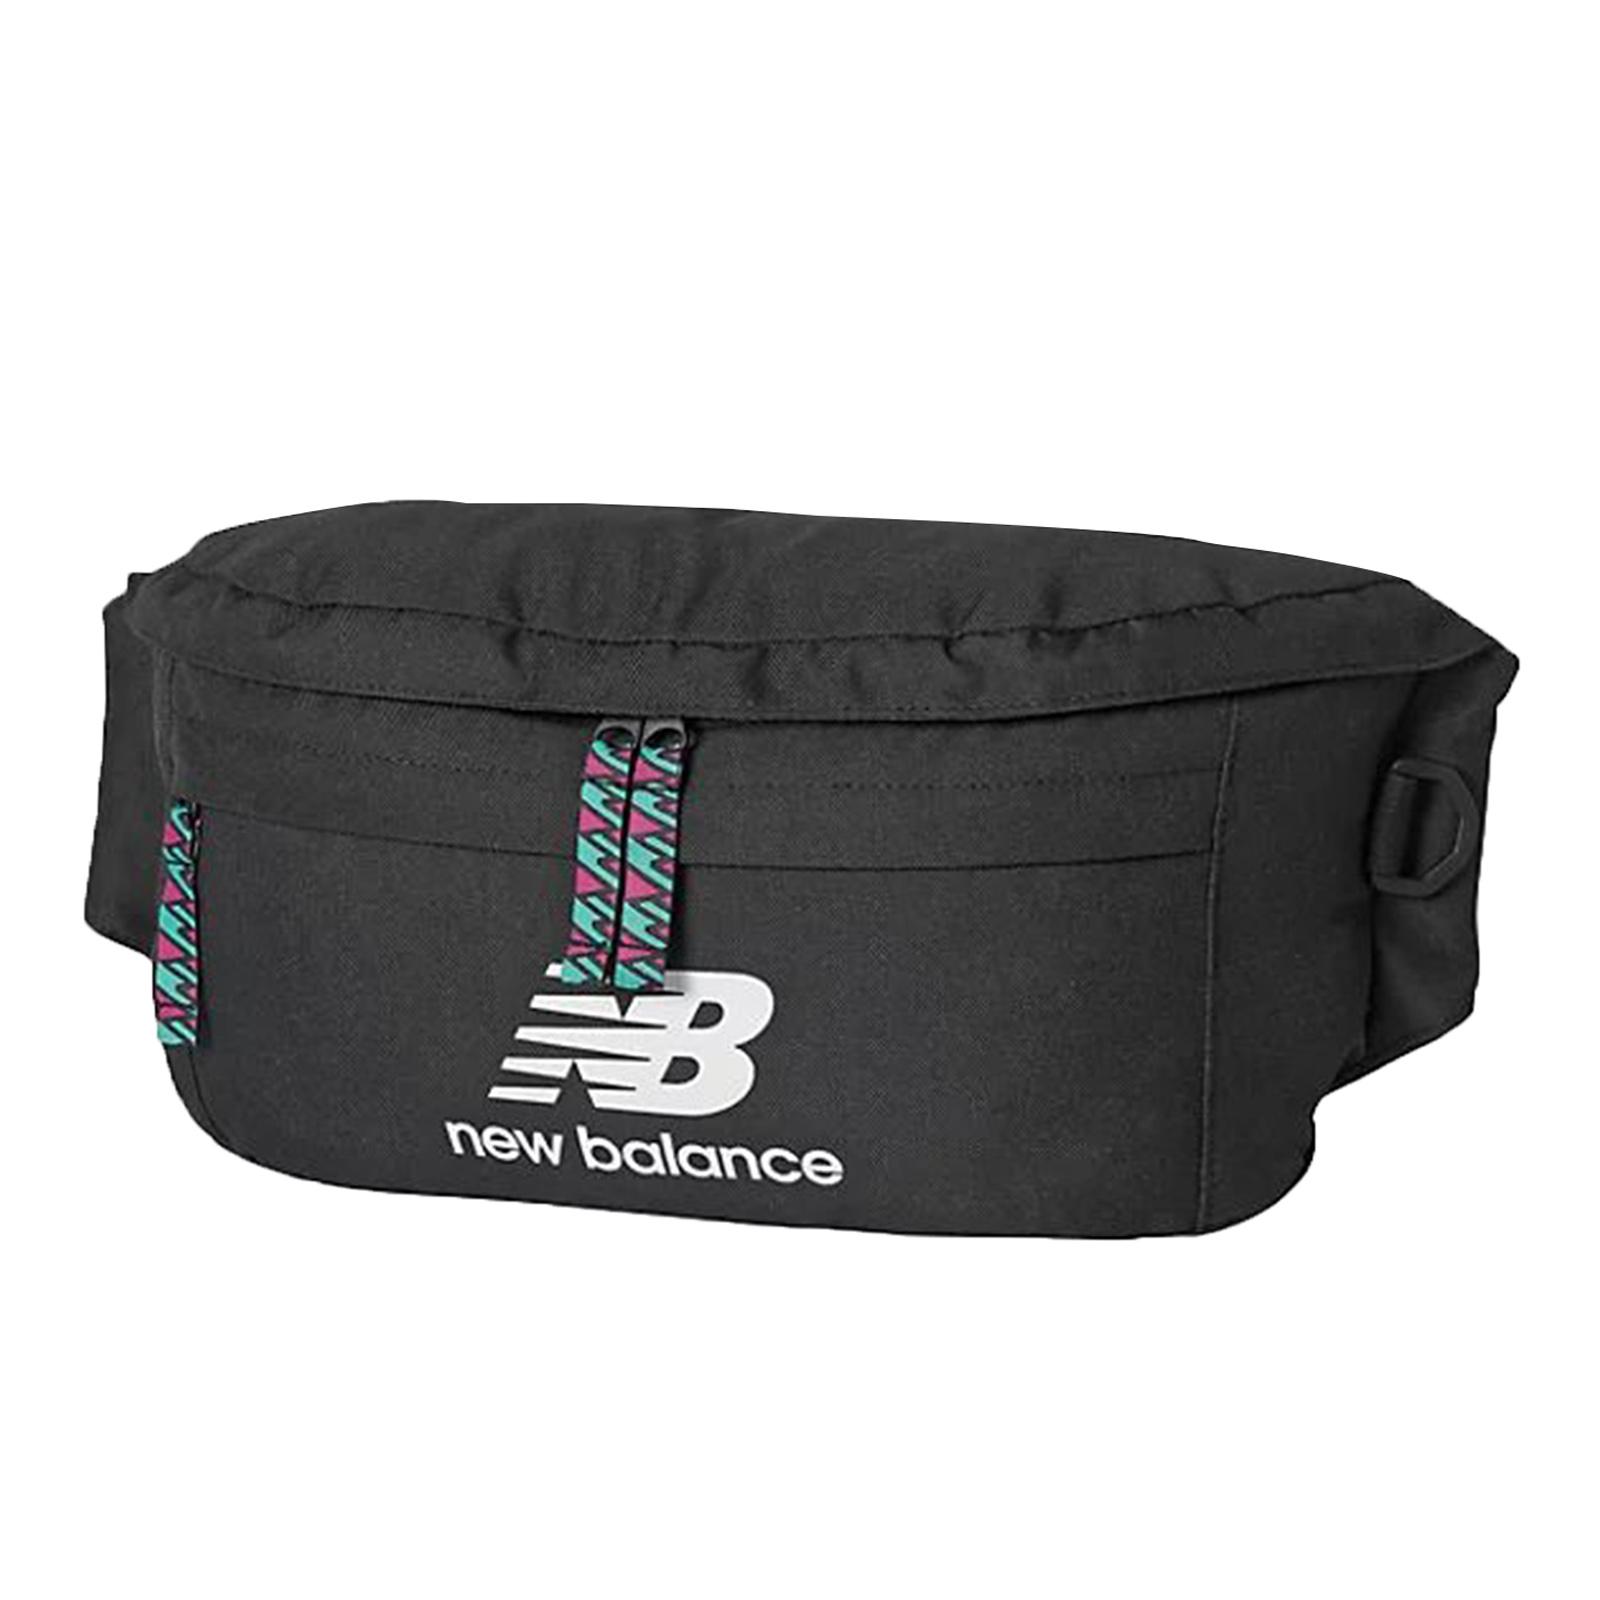 New Balance 腰包 Terrain Waist Pack 黑 白 男女款 斜背包【ACS】EQ03061MBK